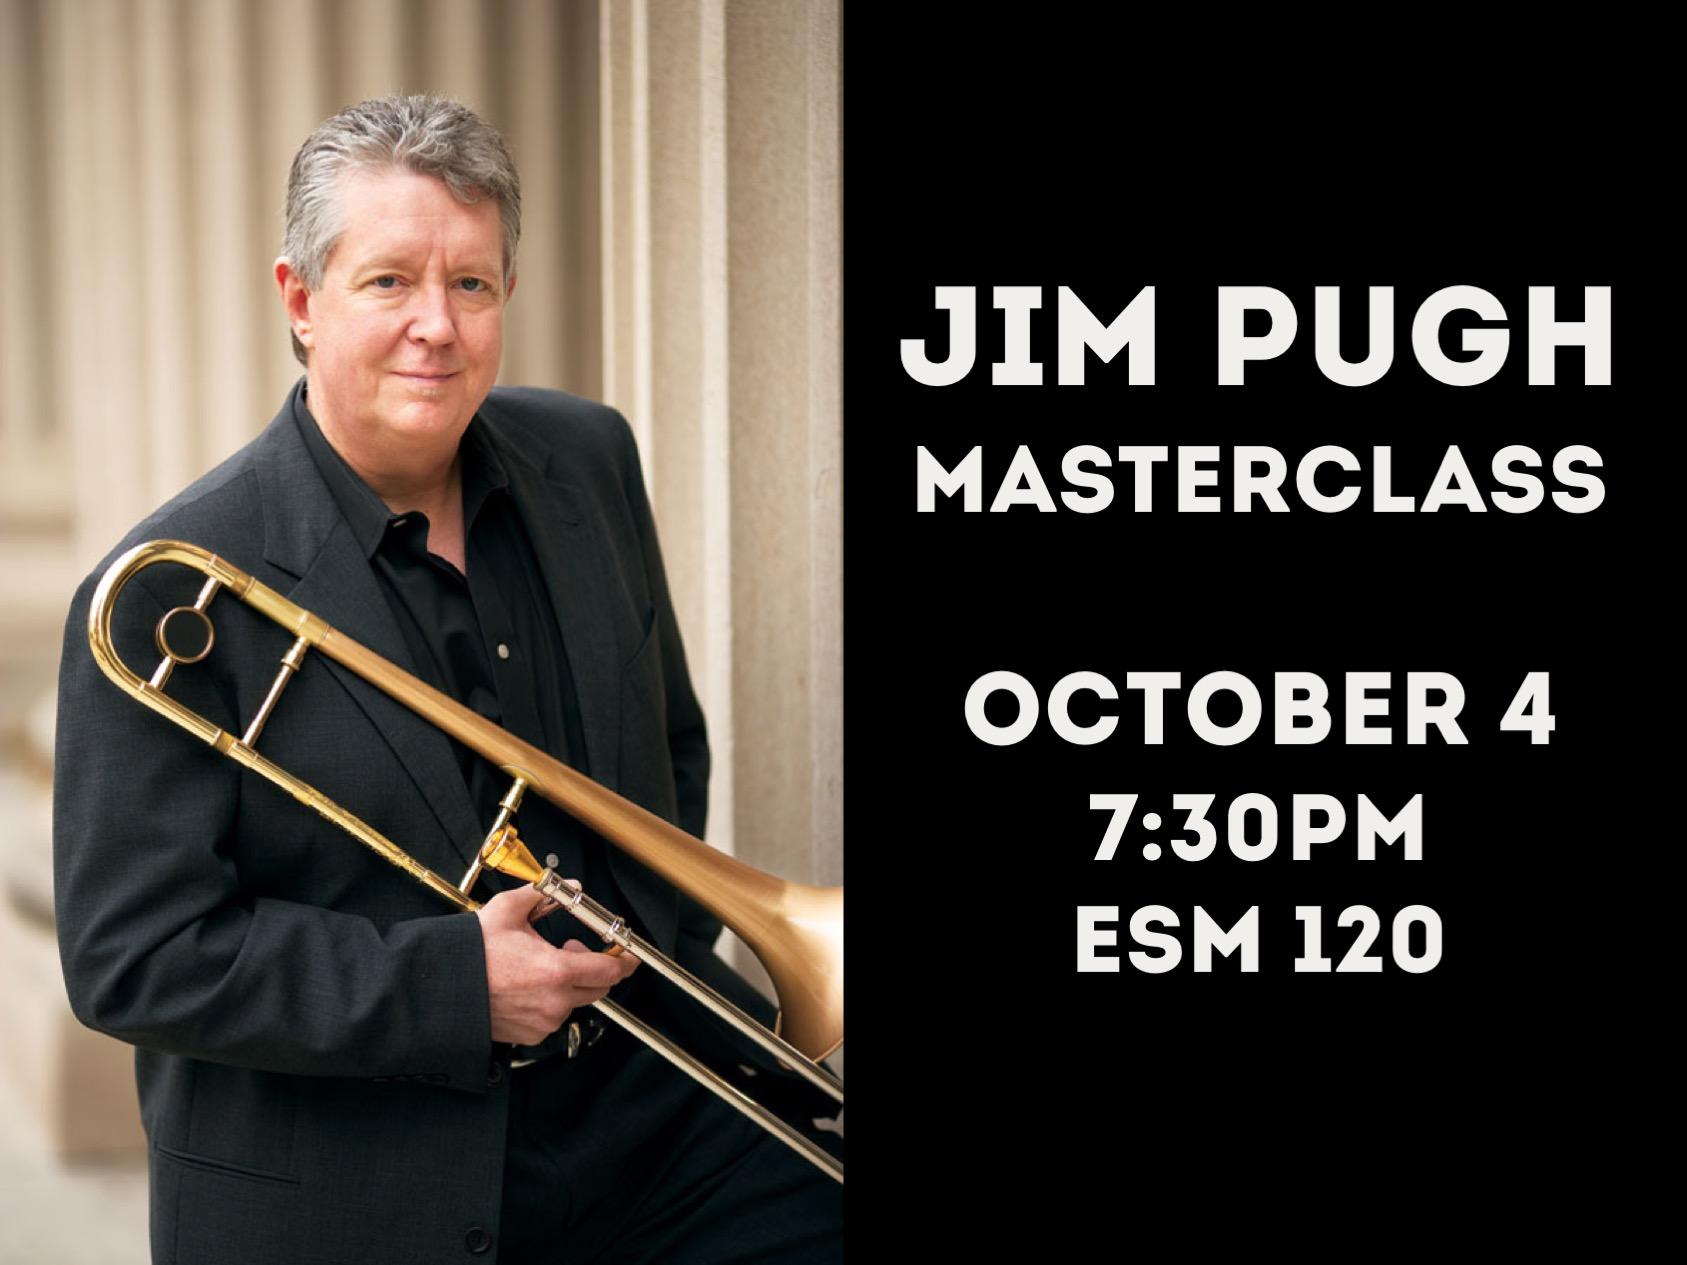 jim-pugh-masterclass